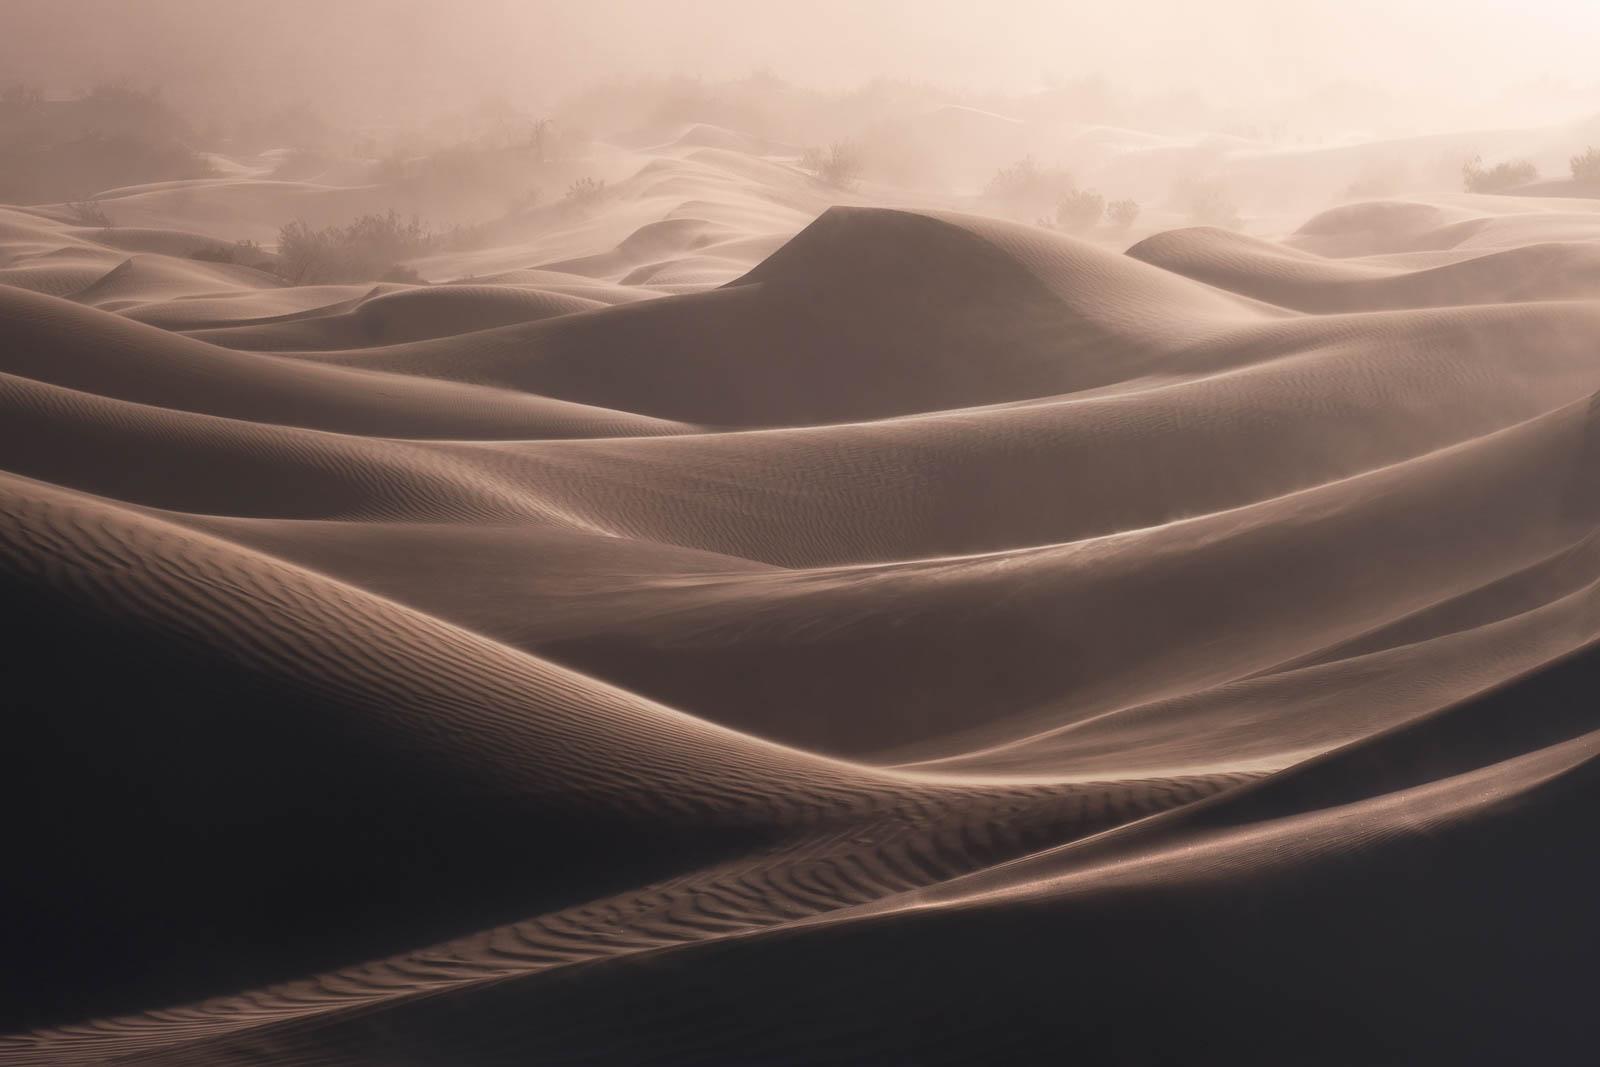 brown, california, death valley national park, dramatic, landscape orientation, mesquite dunes, mojave desert, sand dunes